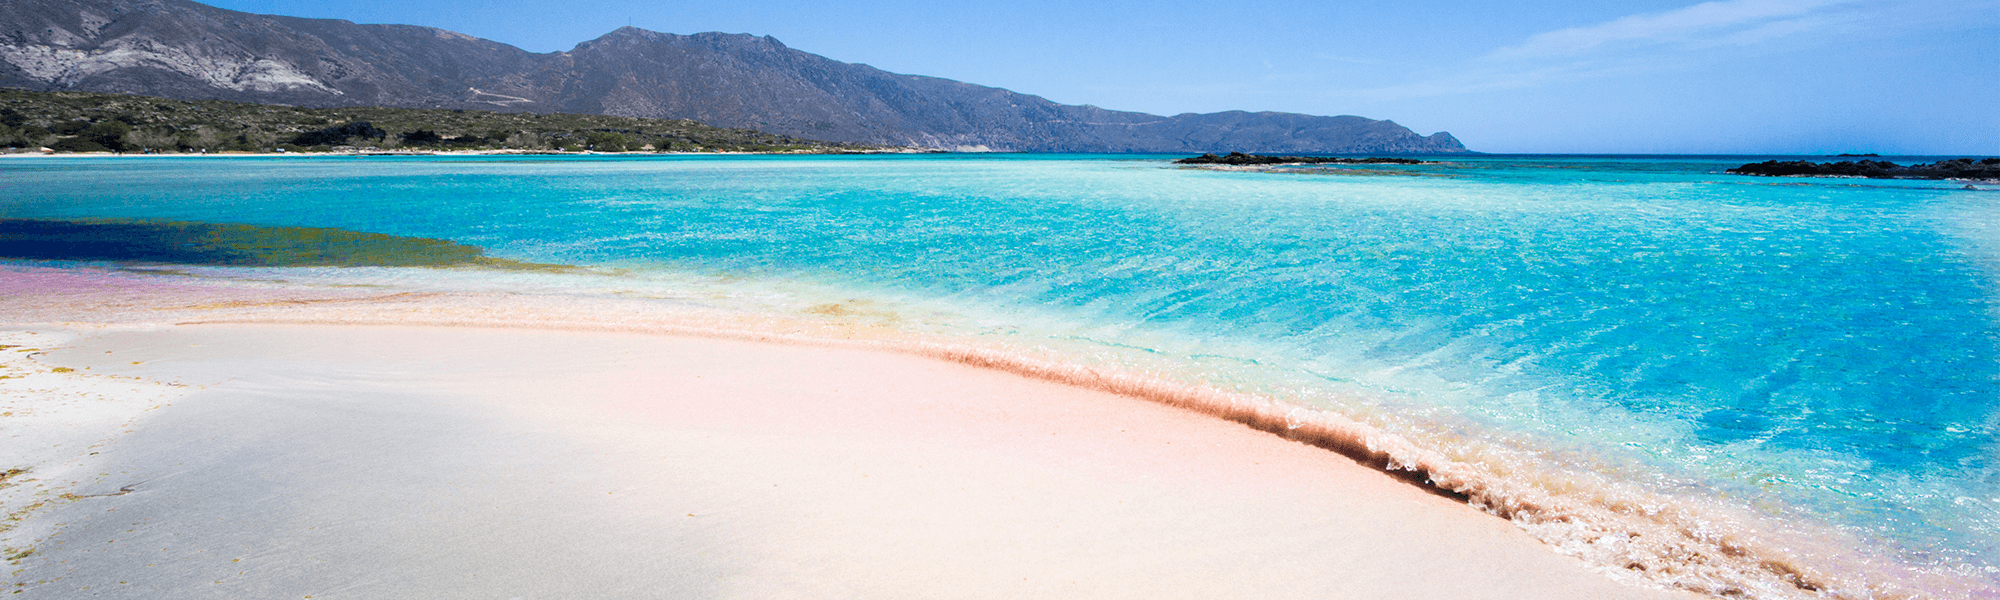 Elafonissi-Pink-Beach